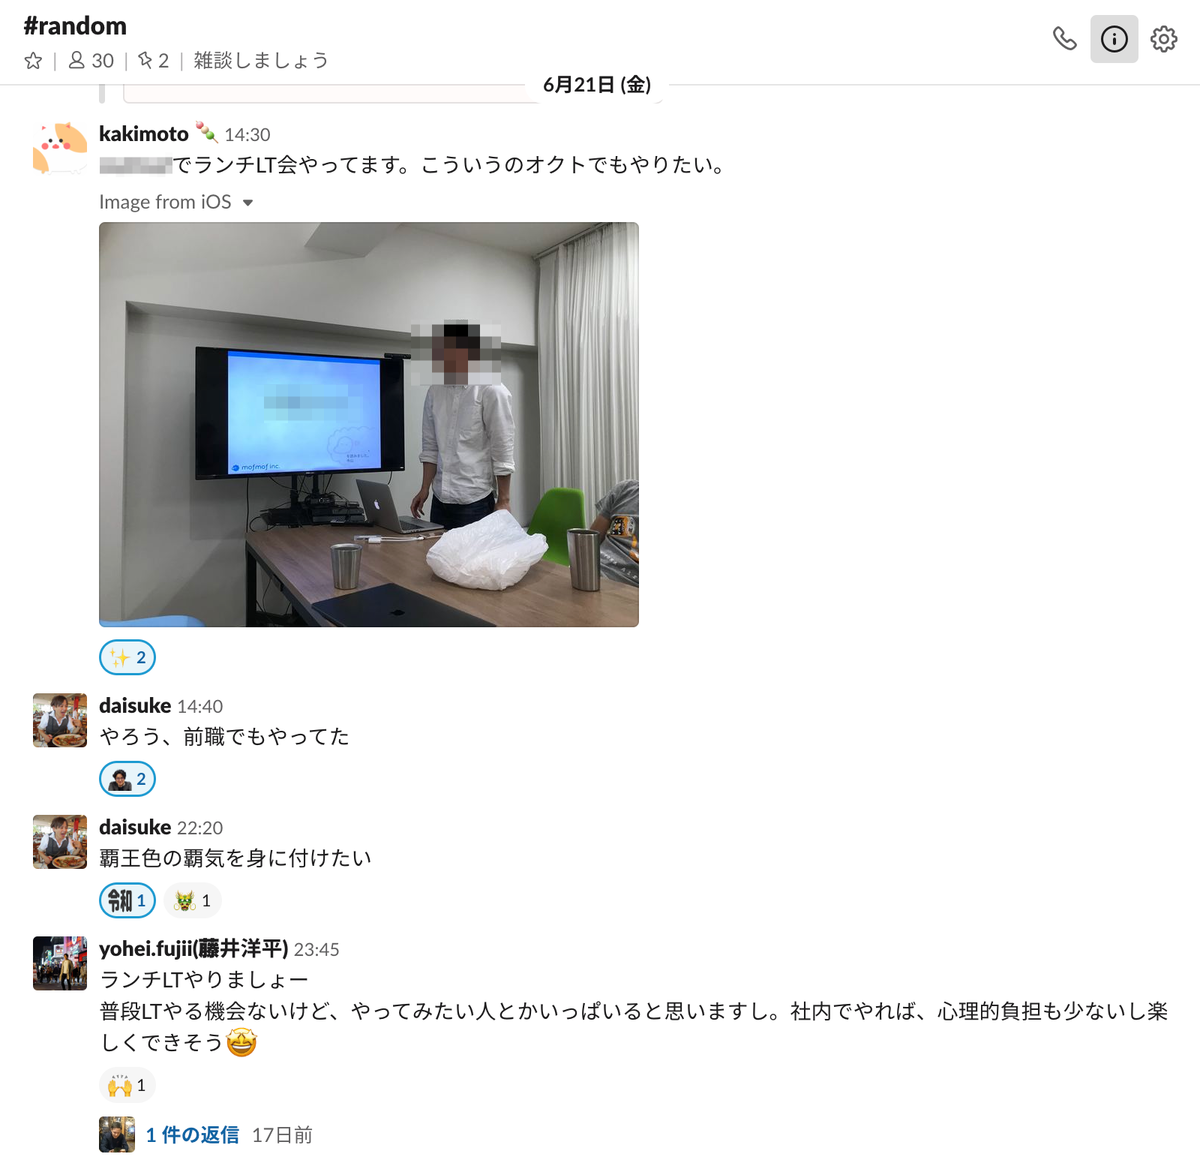 f:id:yohei-fujii:20190711152210p:plain